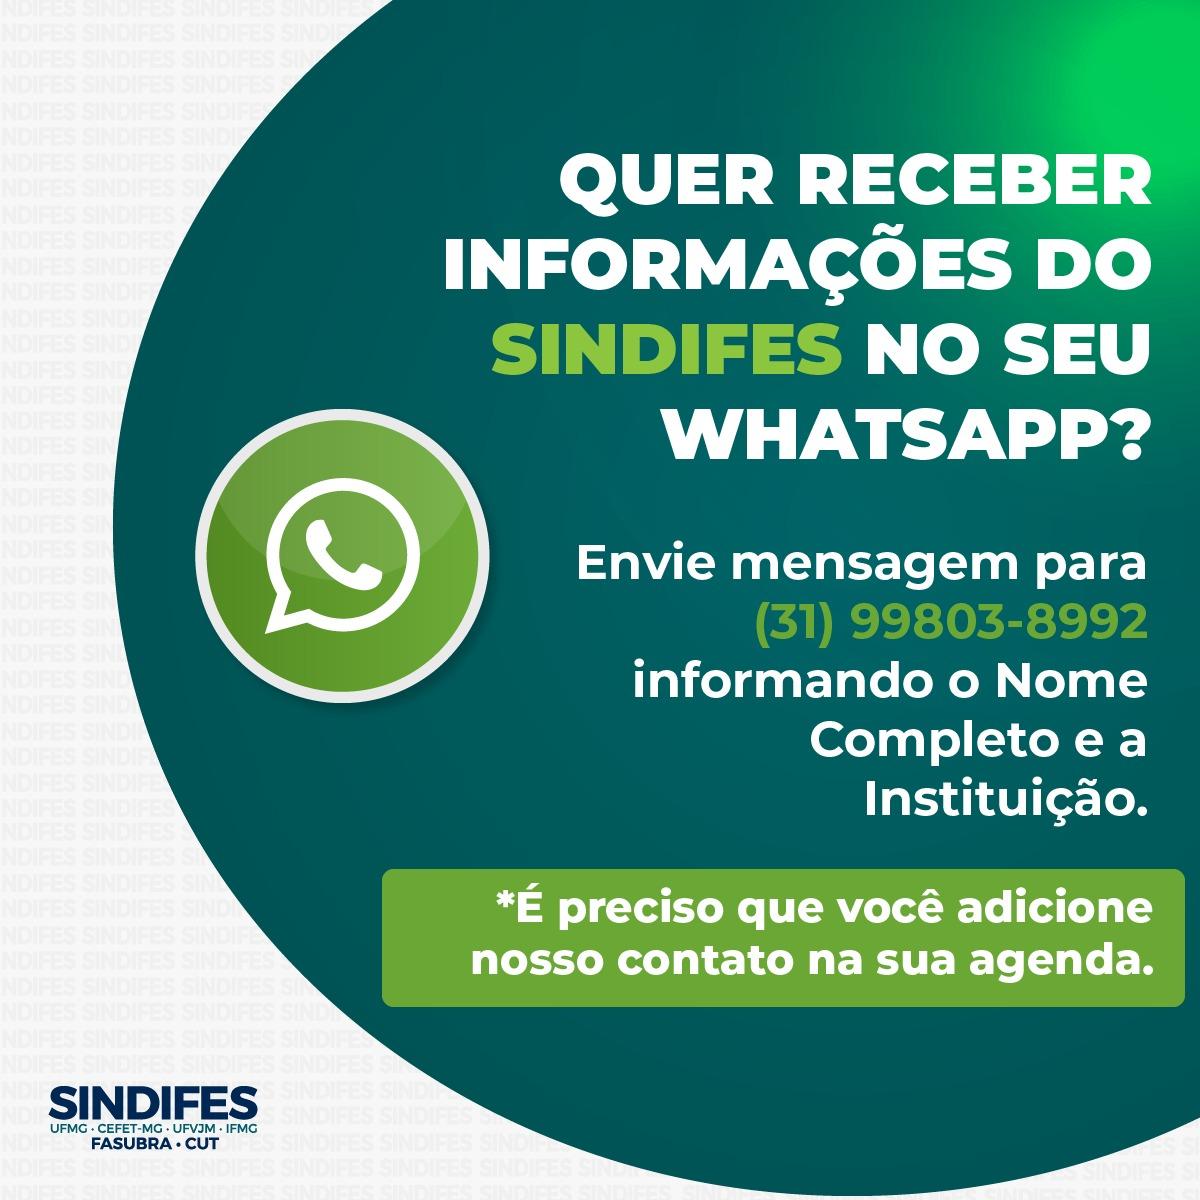 SINDIFES implanta serviços de Whatsapp para filiados 3